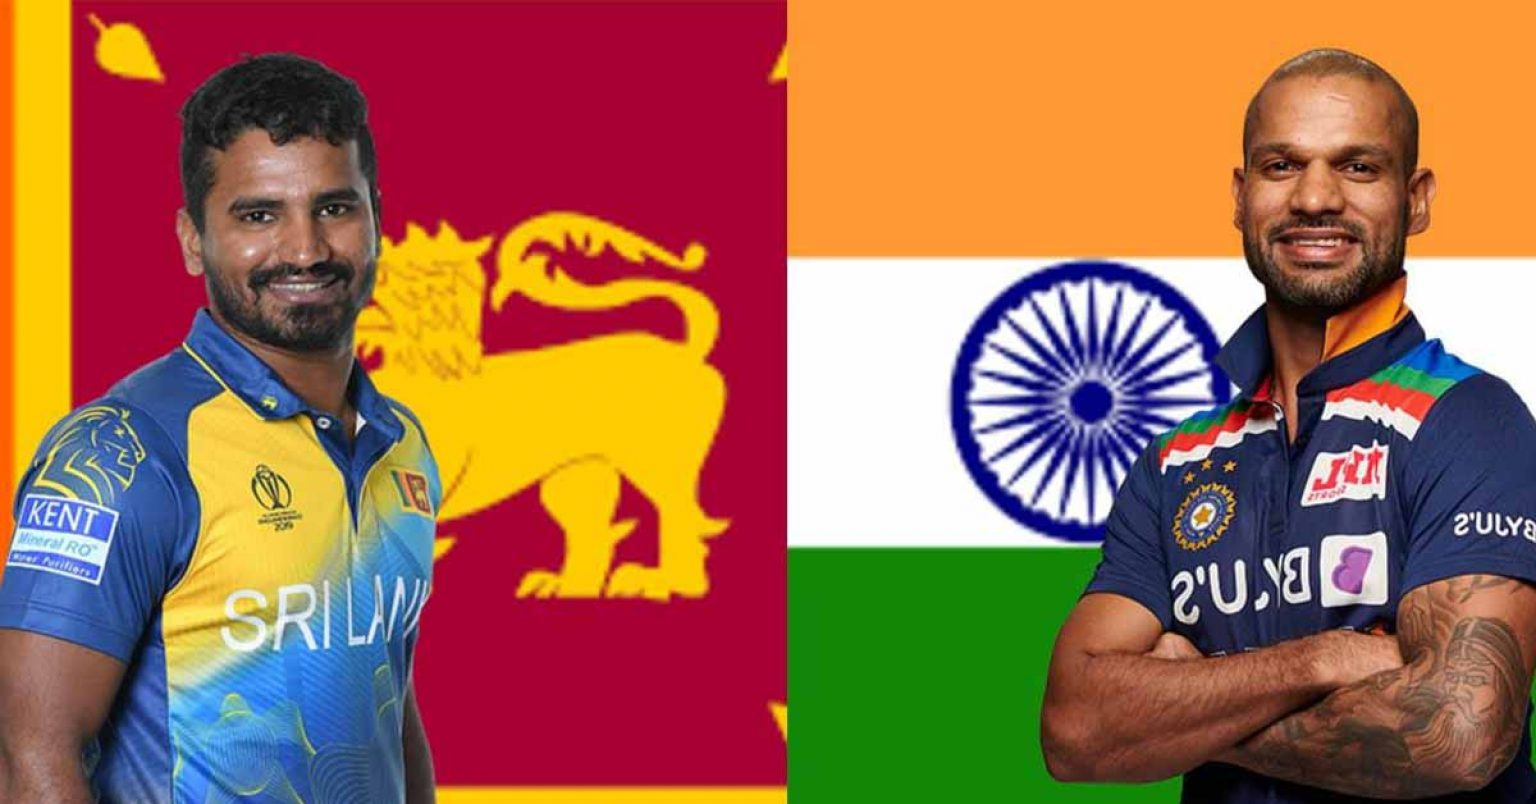 India Vs Sri Lanka Odi T20 2021 Live Match Schedule Tv Channel